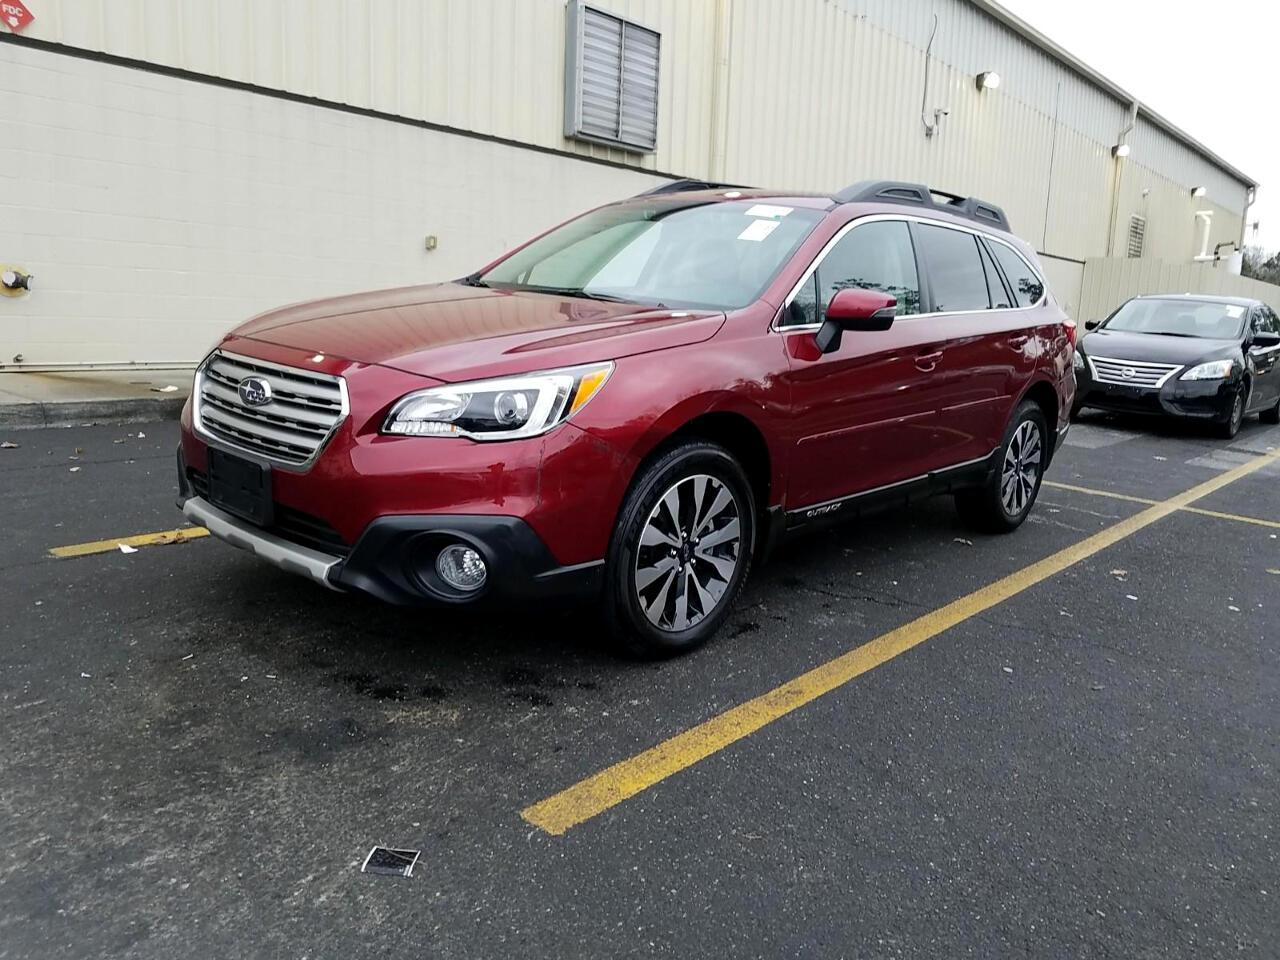 2015 Subaru Outback 4dr Wgn 2.5i Limited PZEV